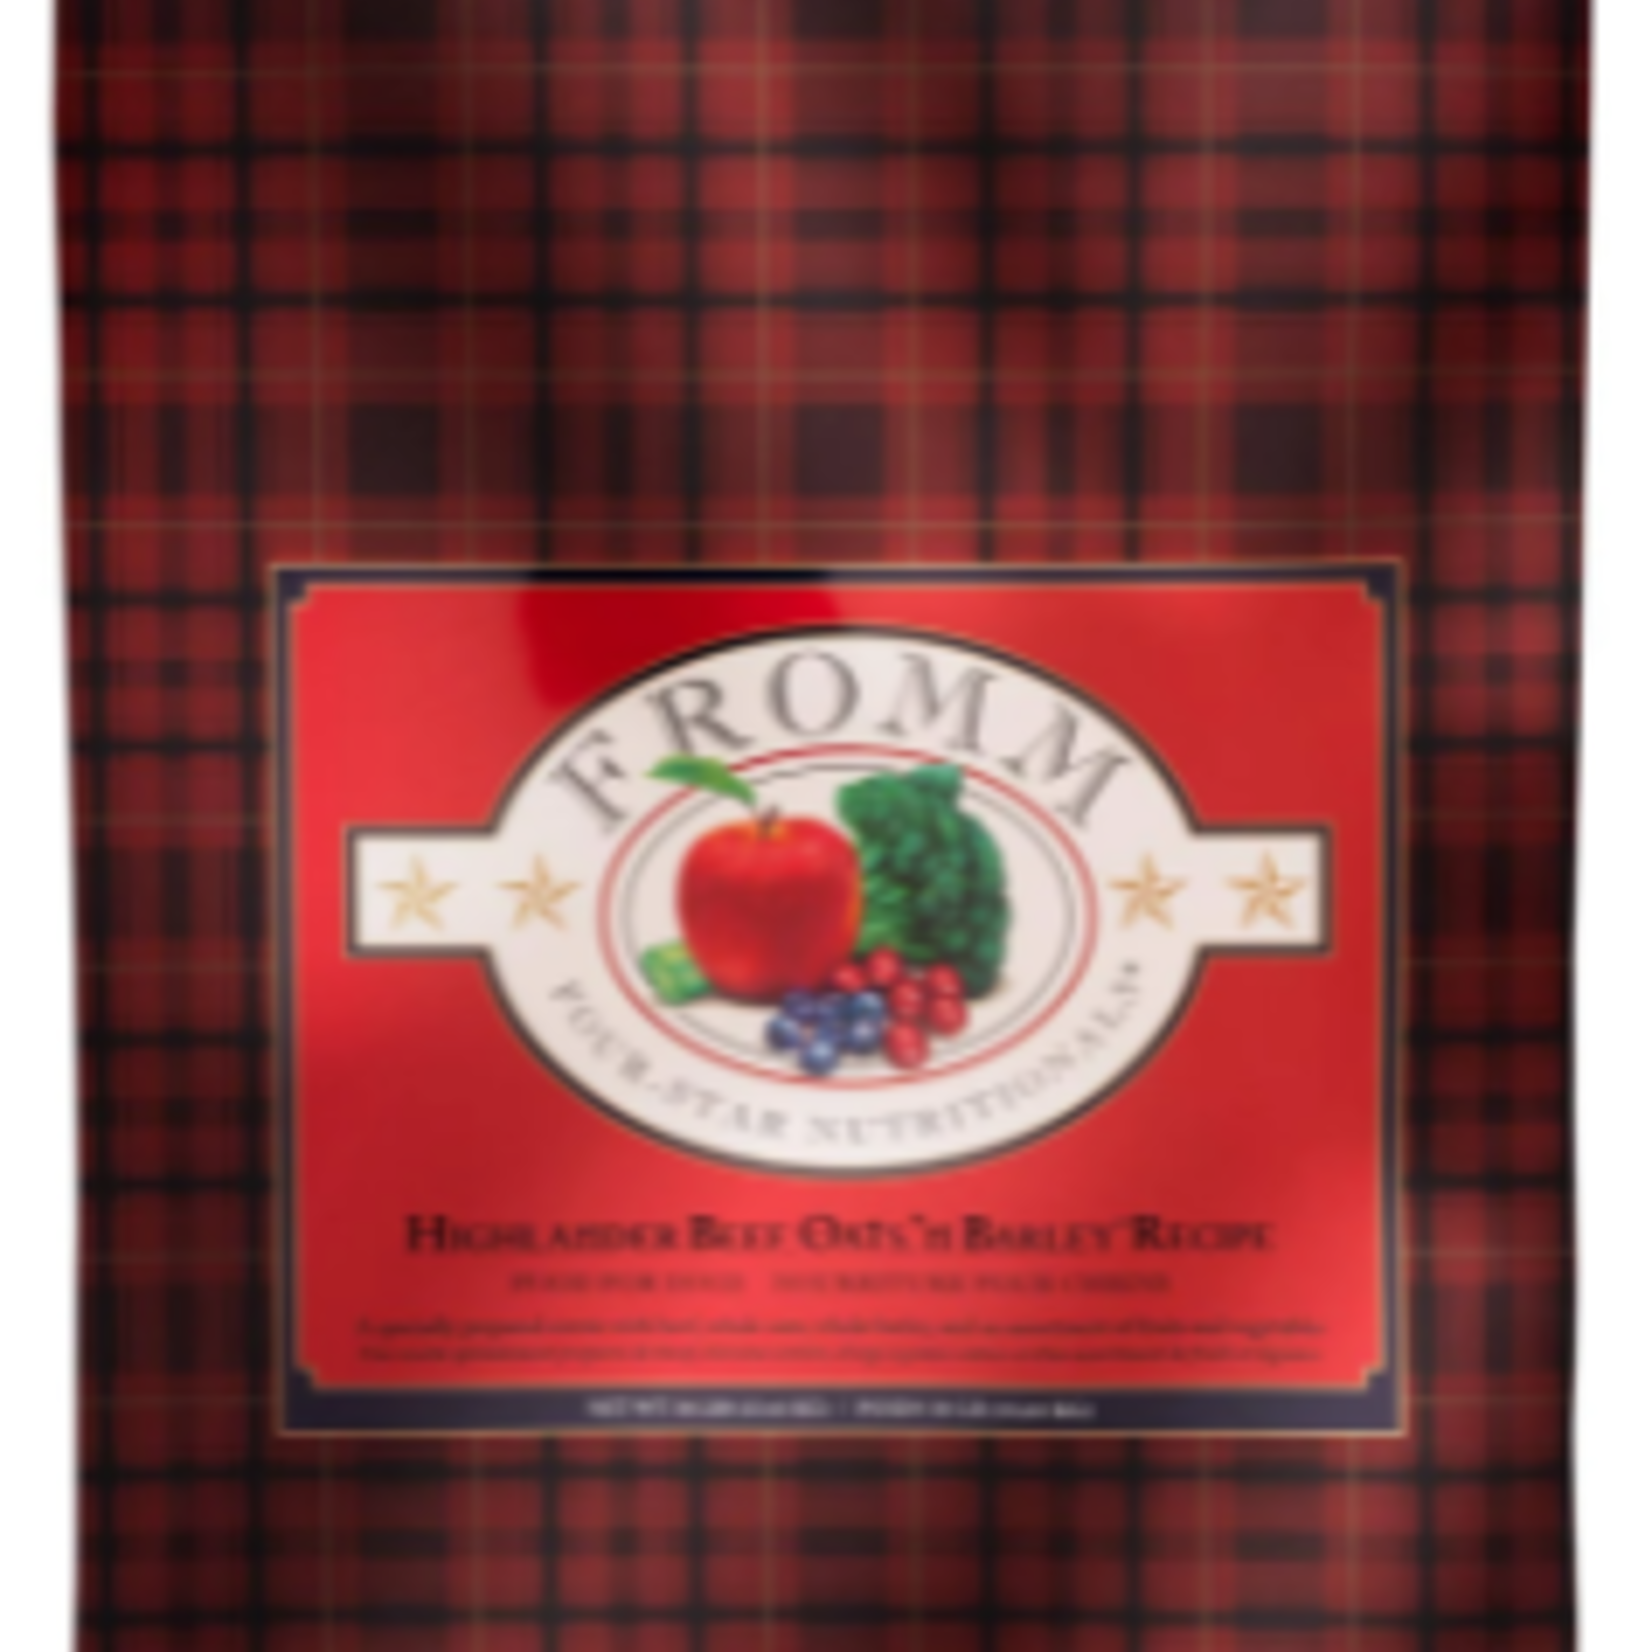 Fromm Highlander Beef - Dog dry food